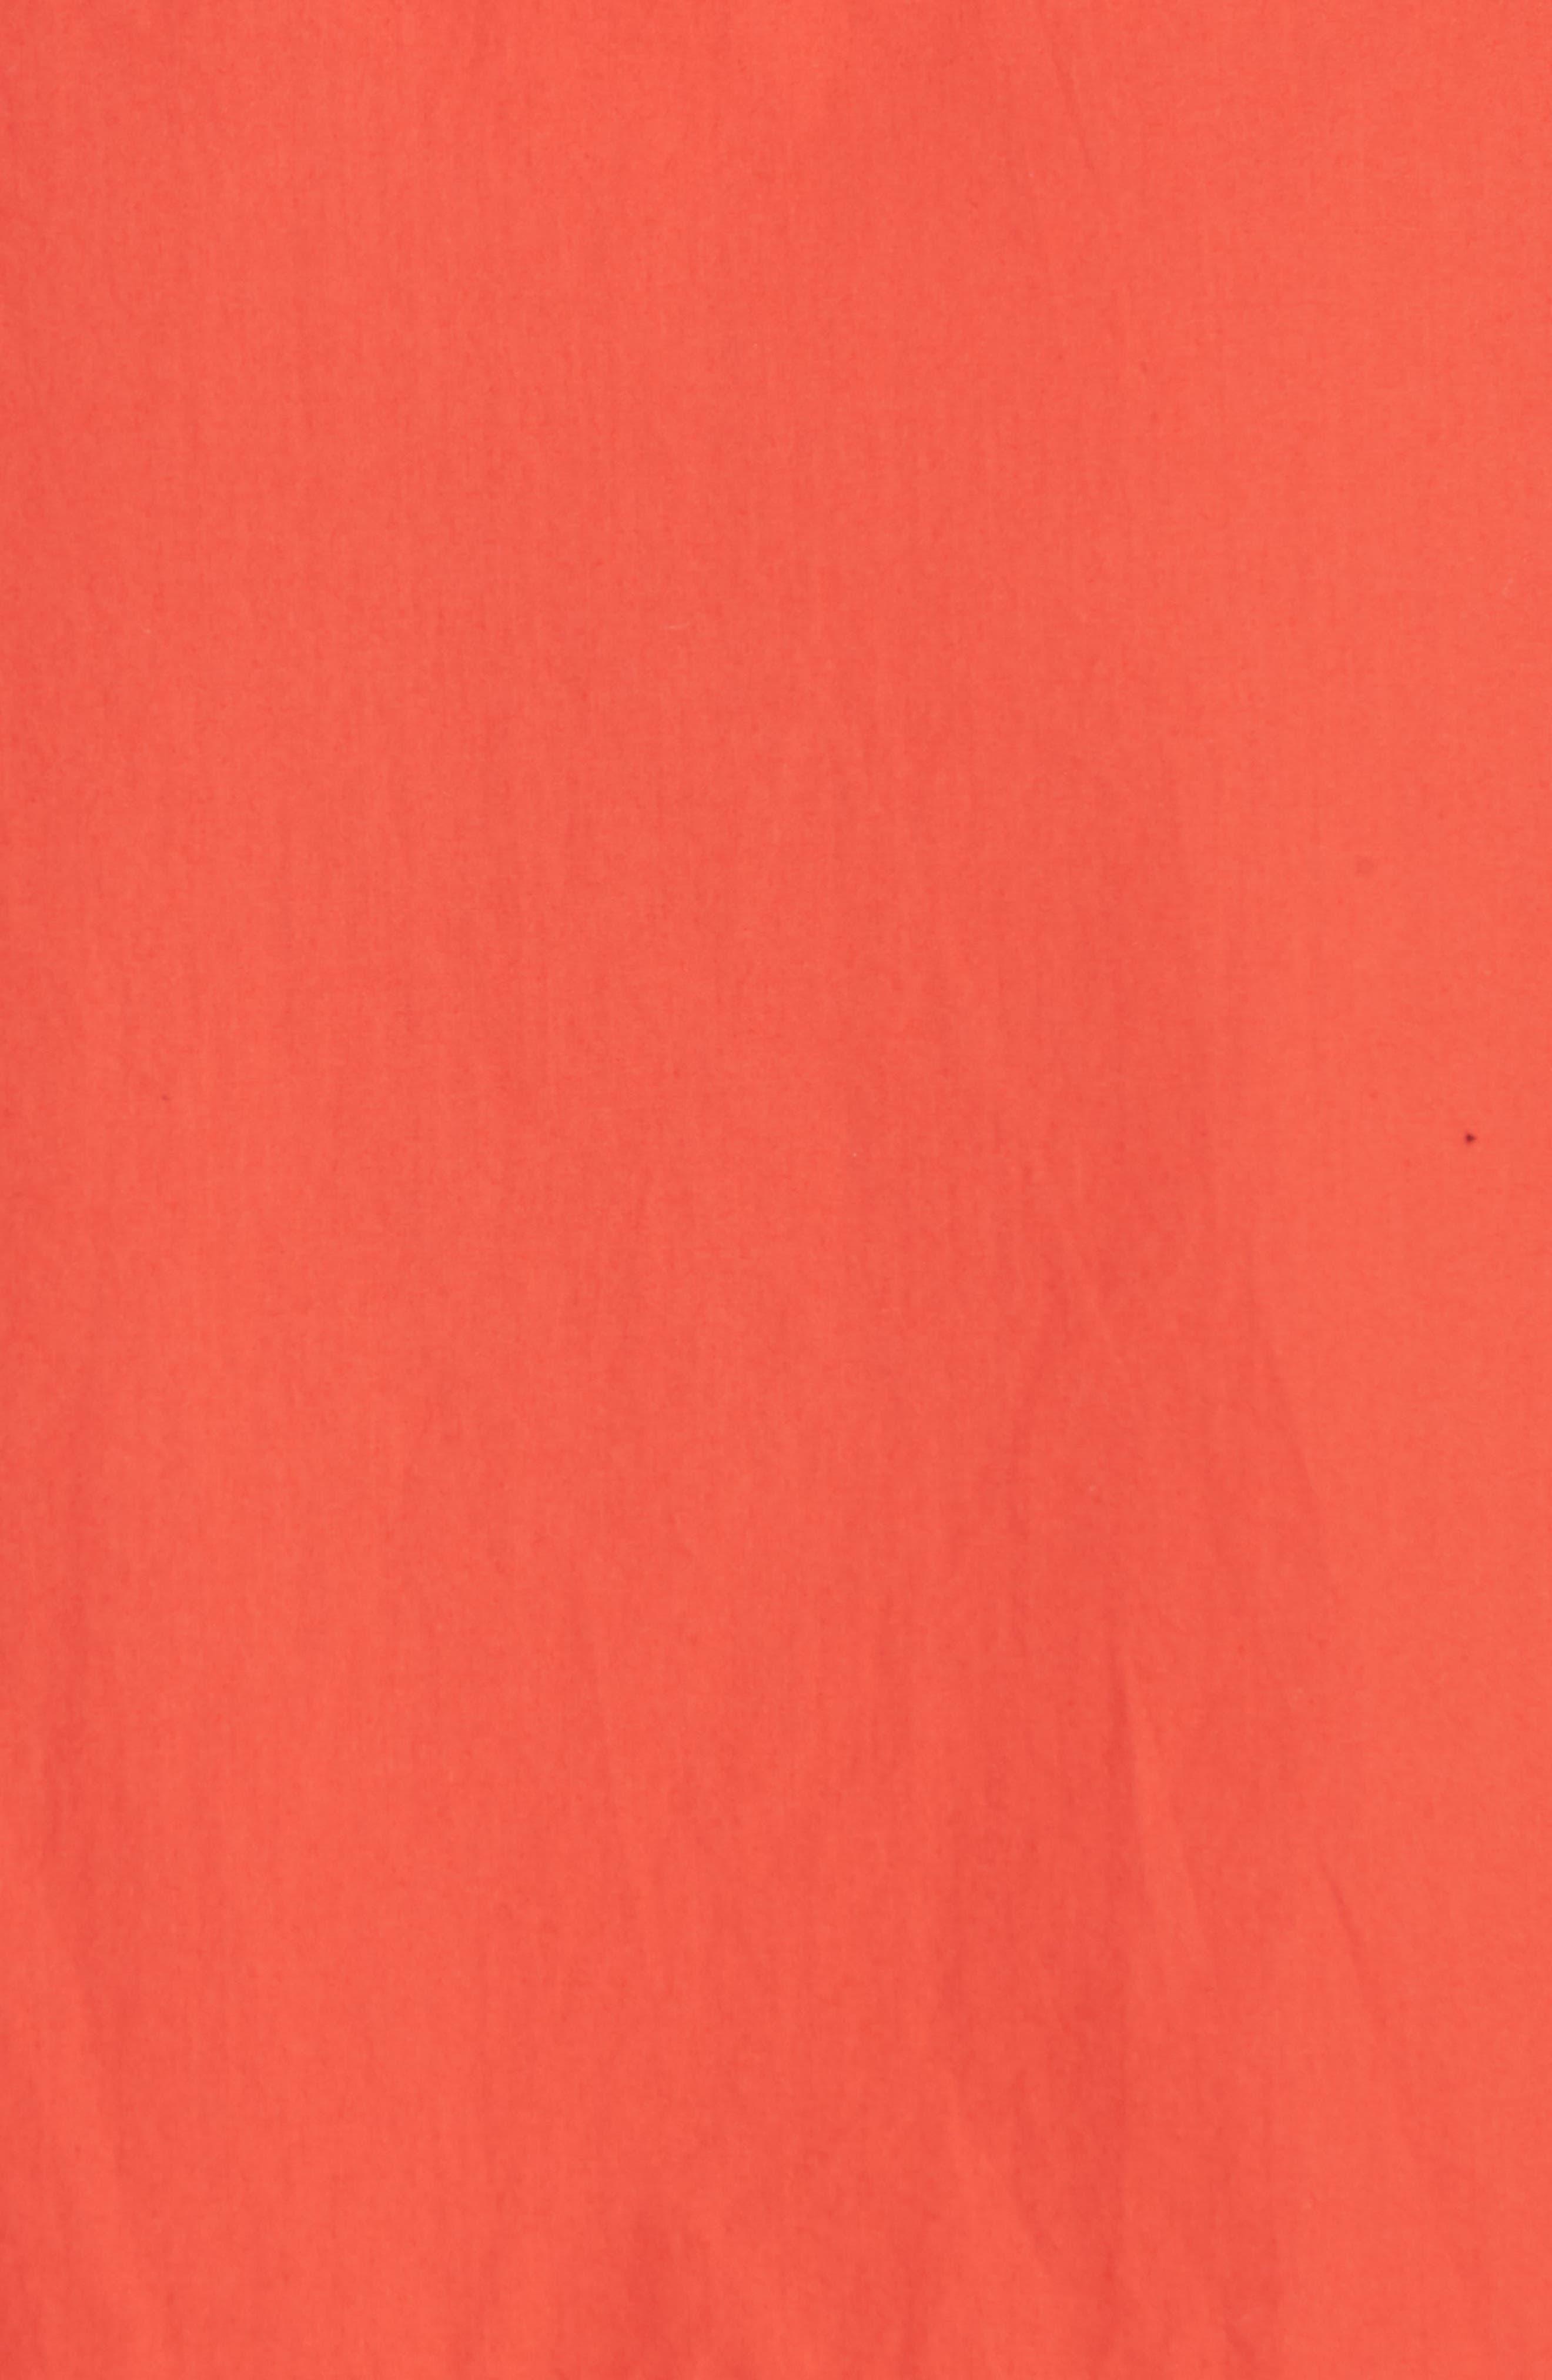 Chesmu Ruffled Cotton Skirt,                             Alternate thumbnail 5, color,                             Salsa